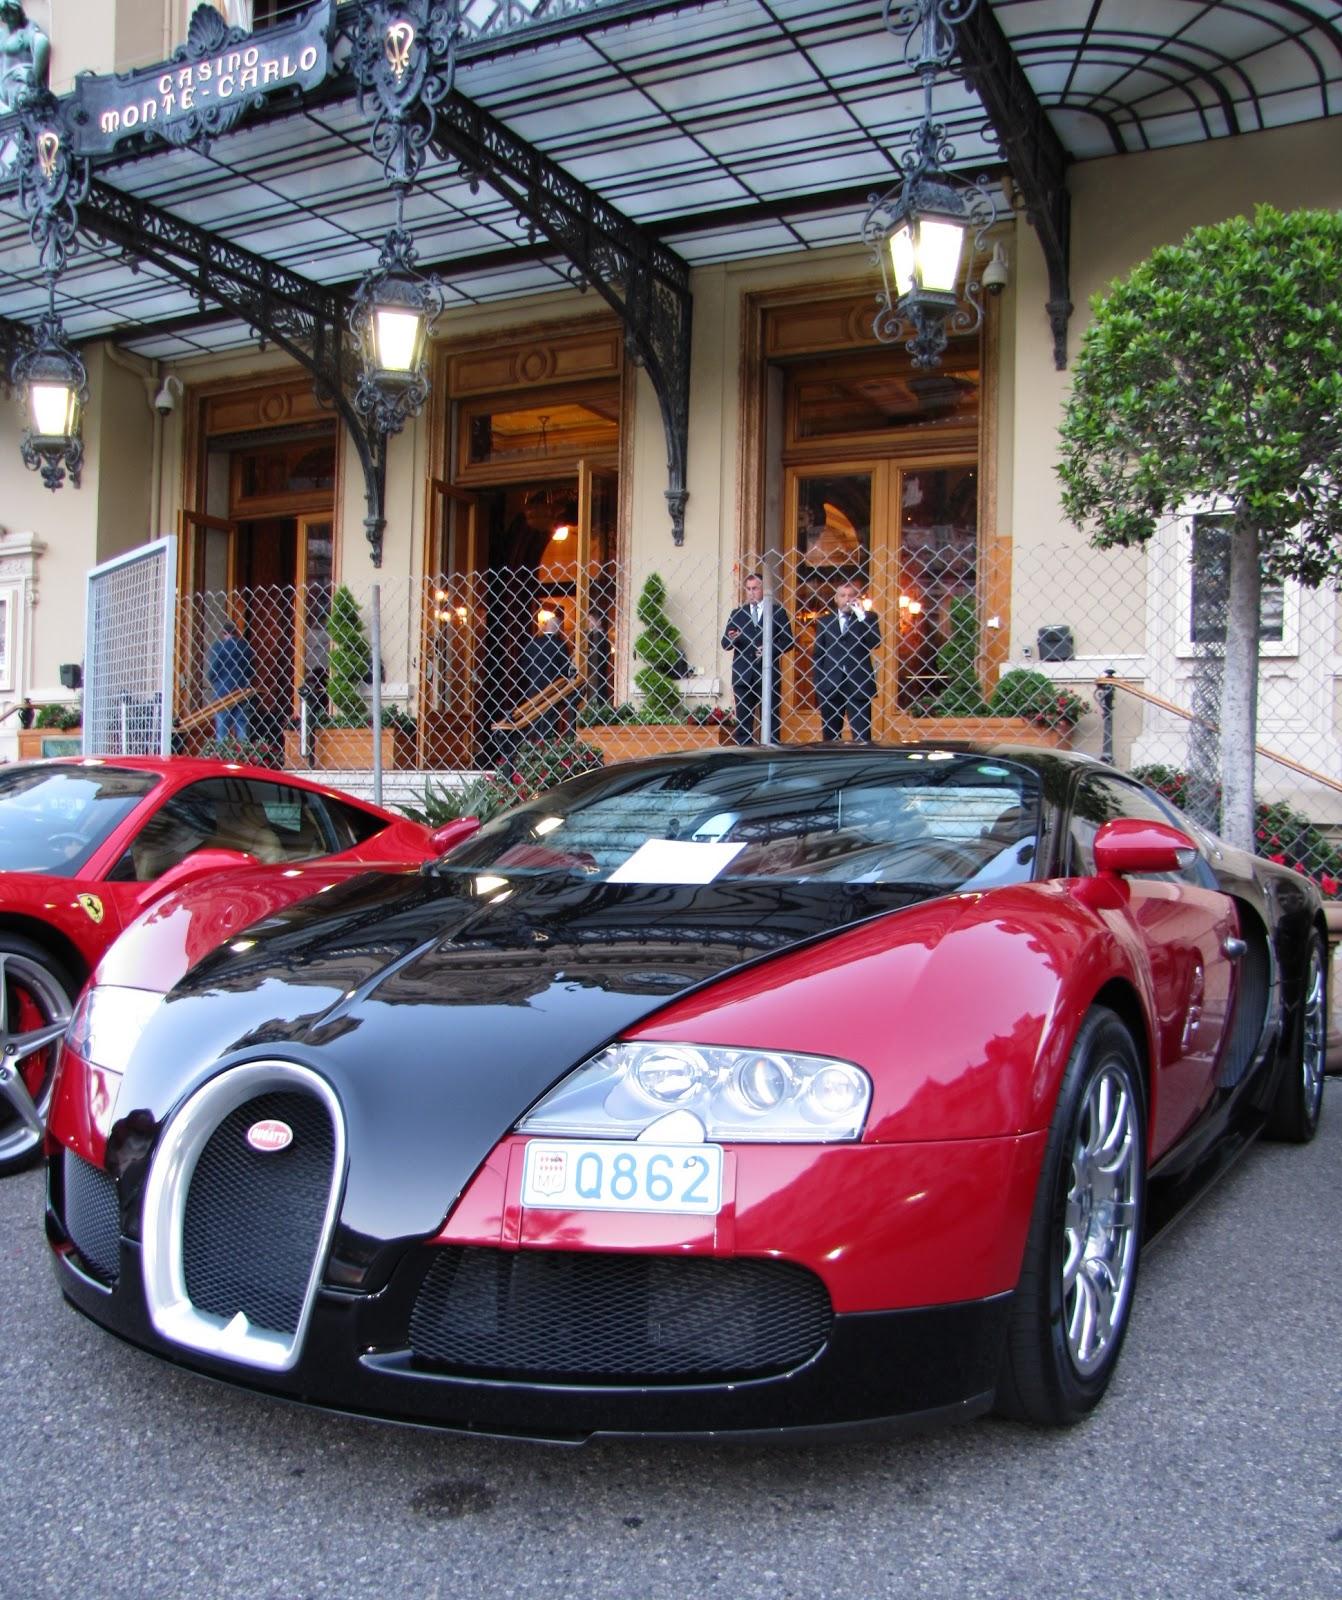 Black Bugatti: Monaco Car Show: Bugatti Veyron